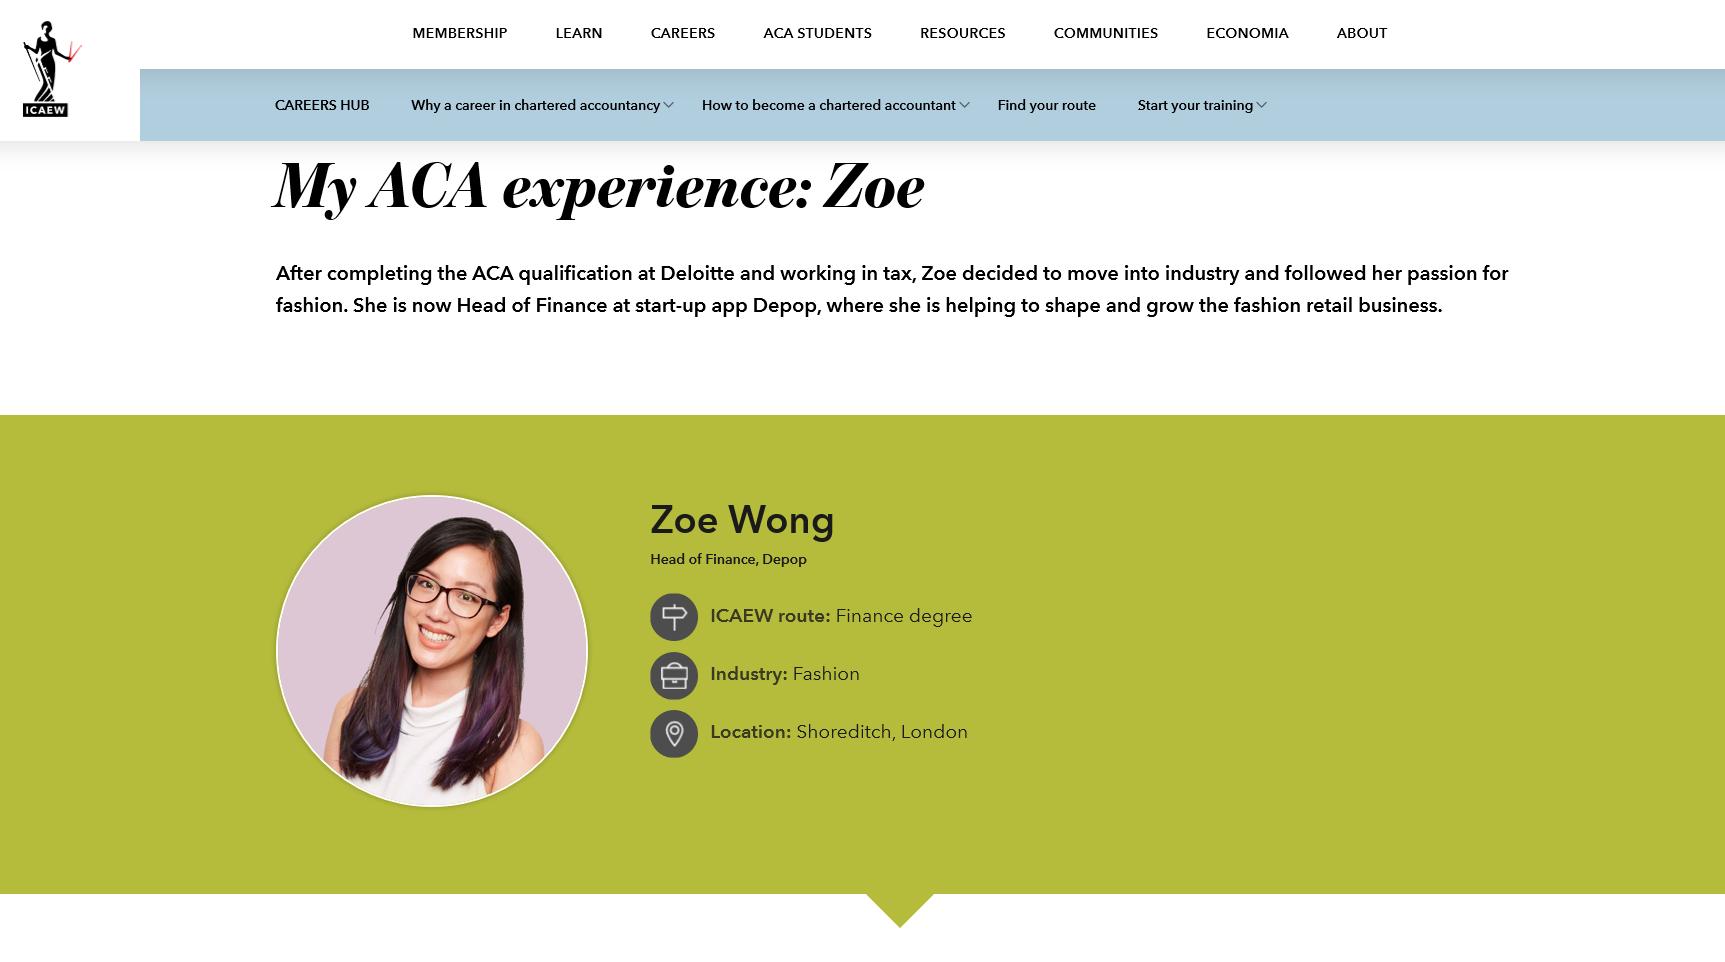 ICAEW - Zoe Wong Case Study